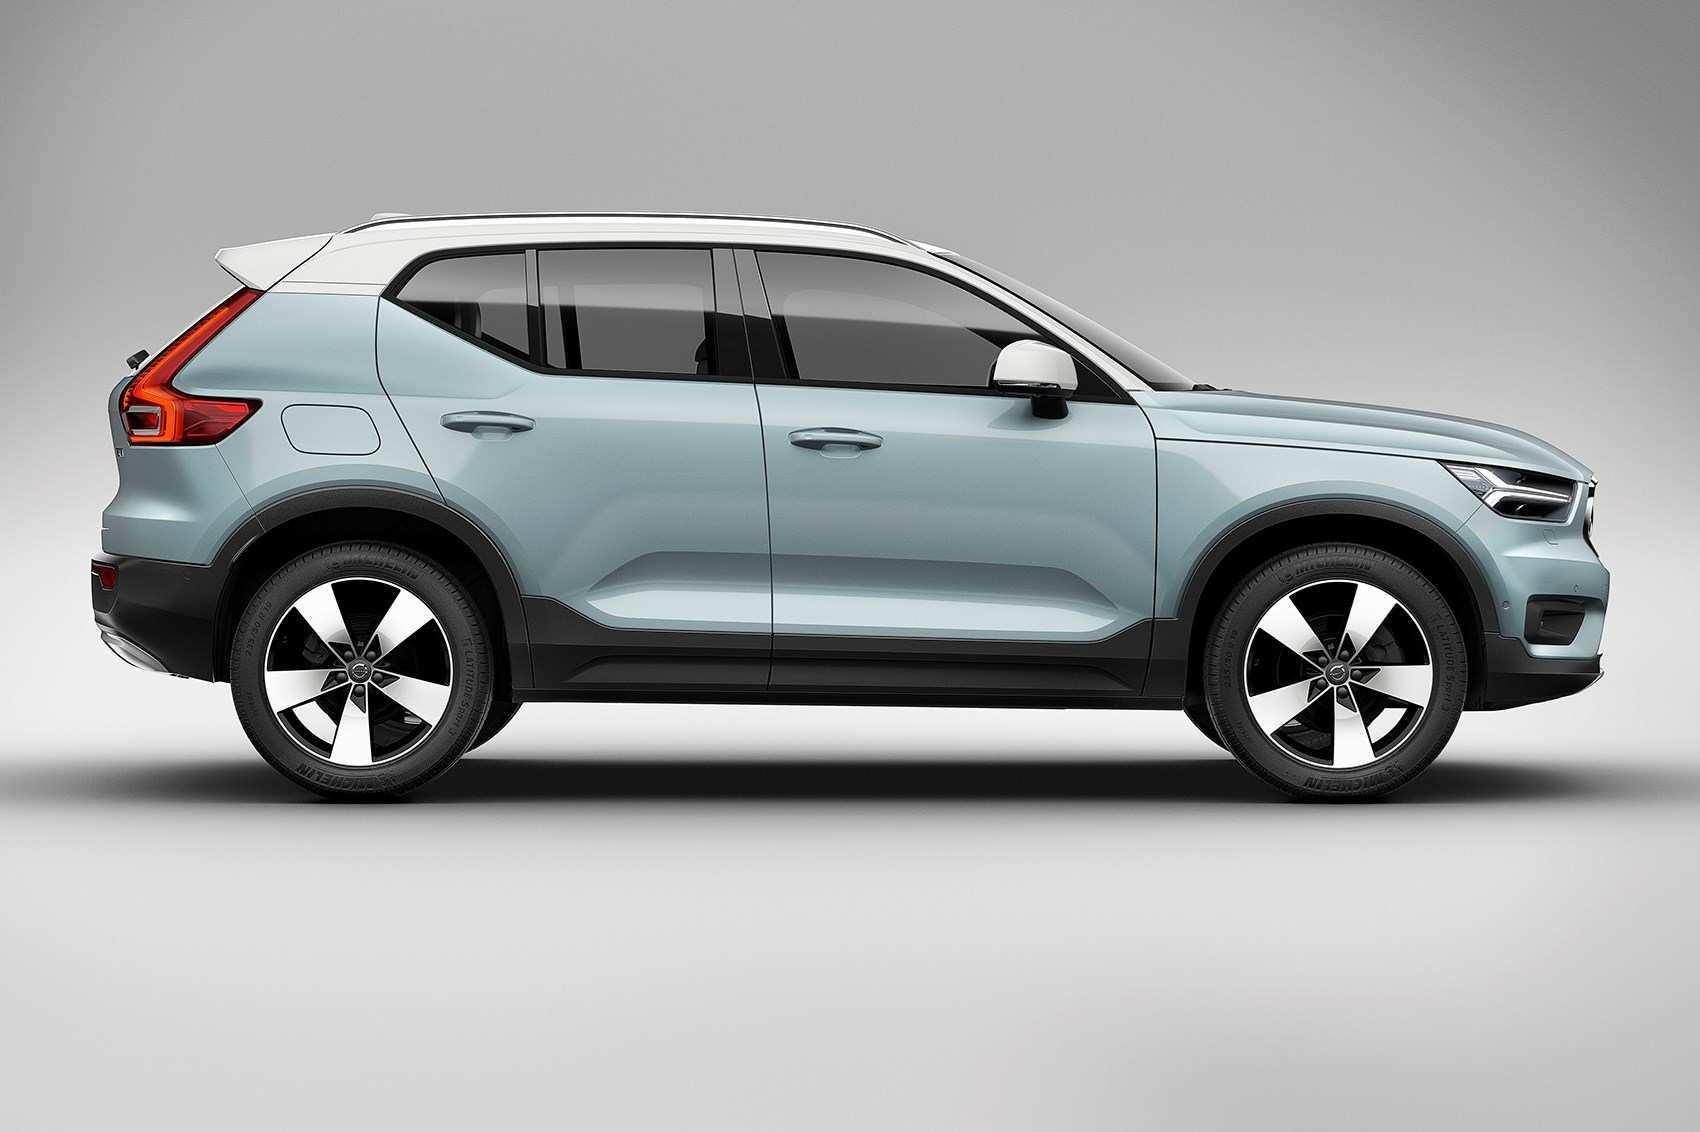 11 All New 2020 Volvo Xc40 Hybrid Reviews with 2020 Volvo Xc40 Hybrid